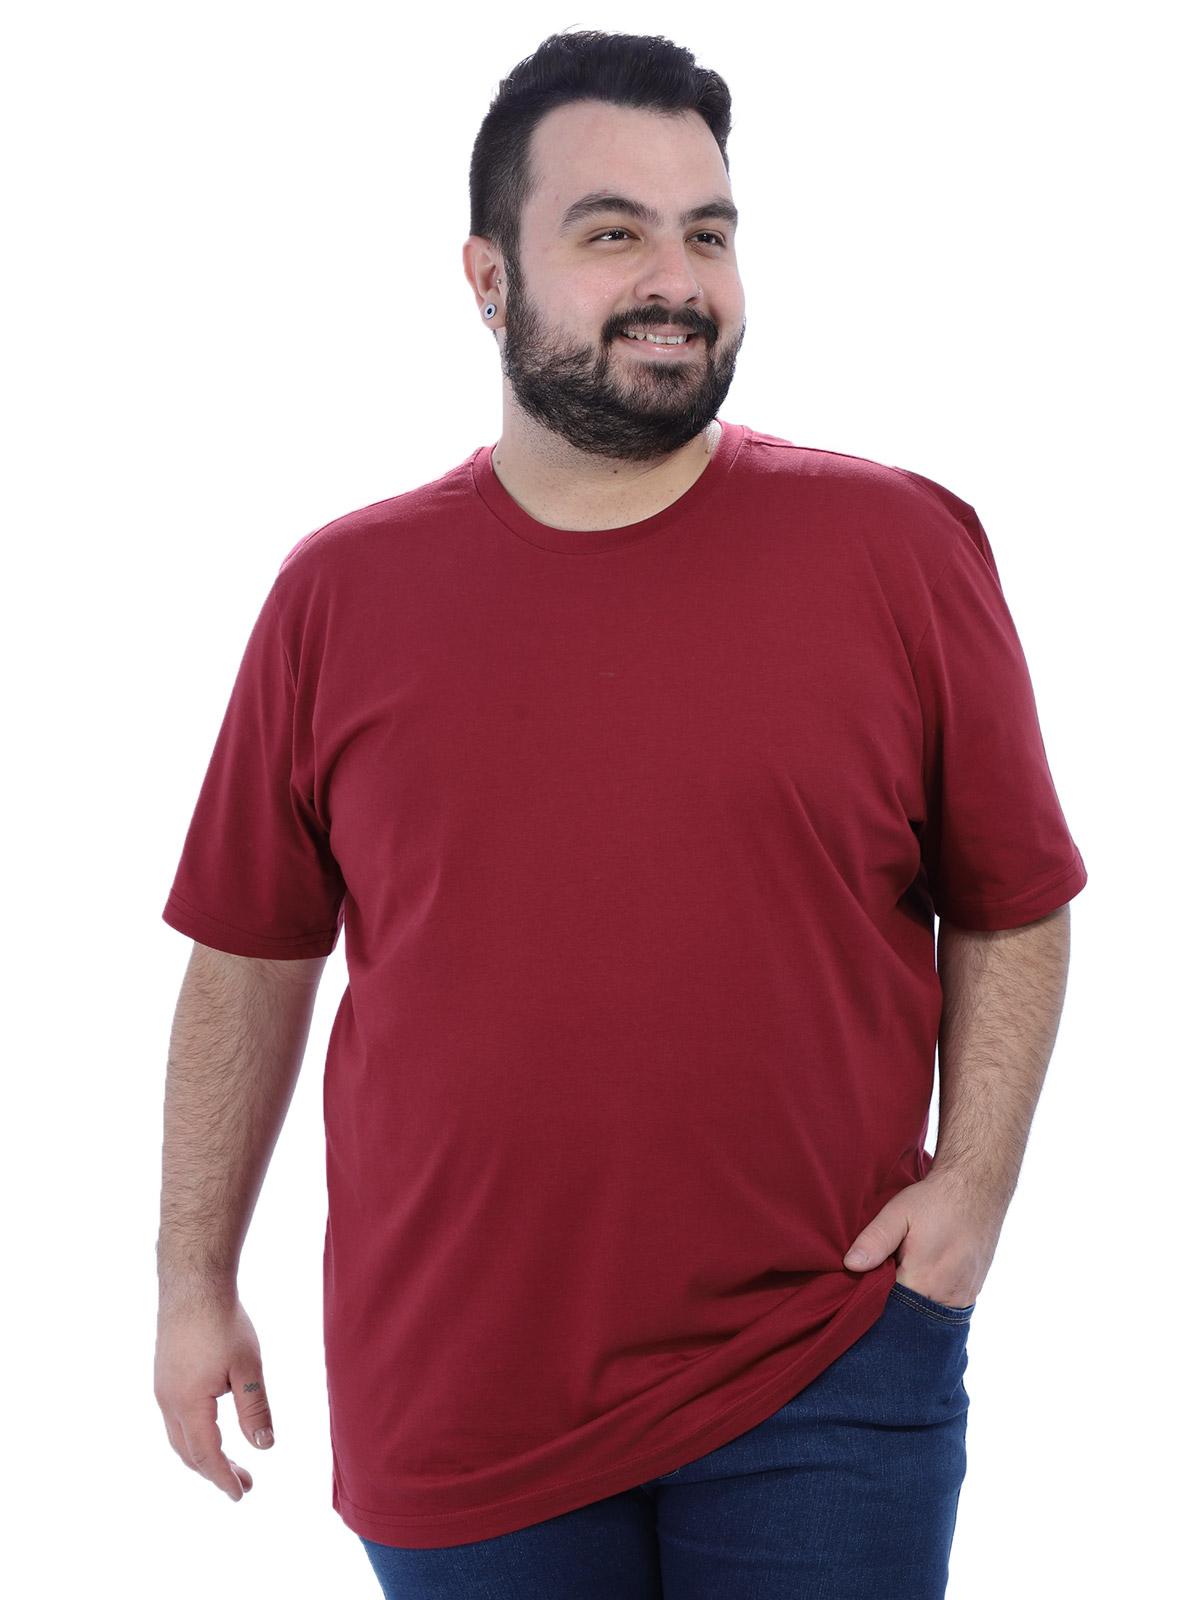 Camiseta Plus Size Lisa Masculino Básica Algodão Bordo